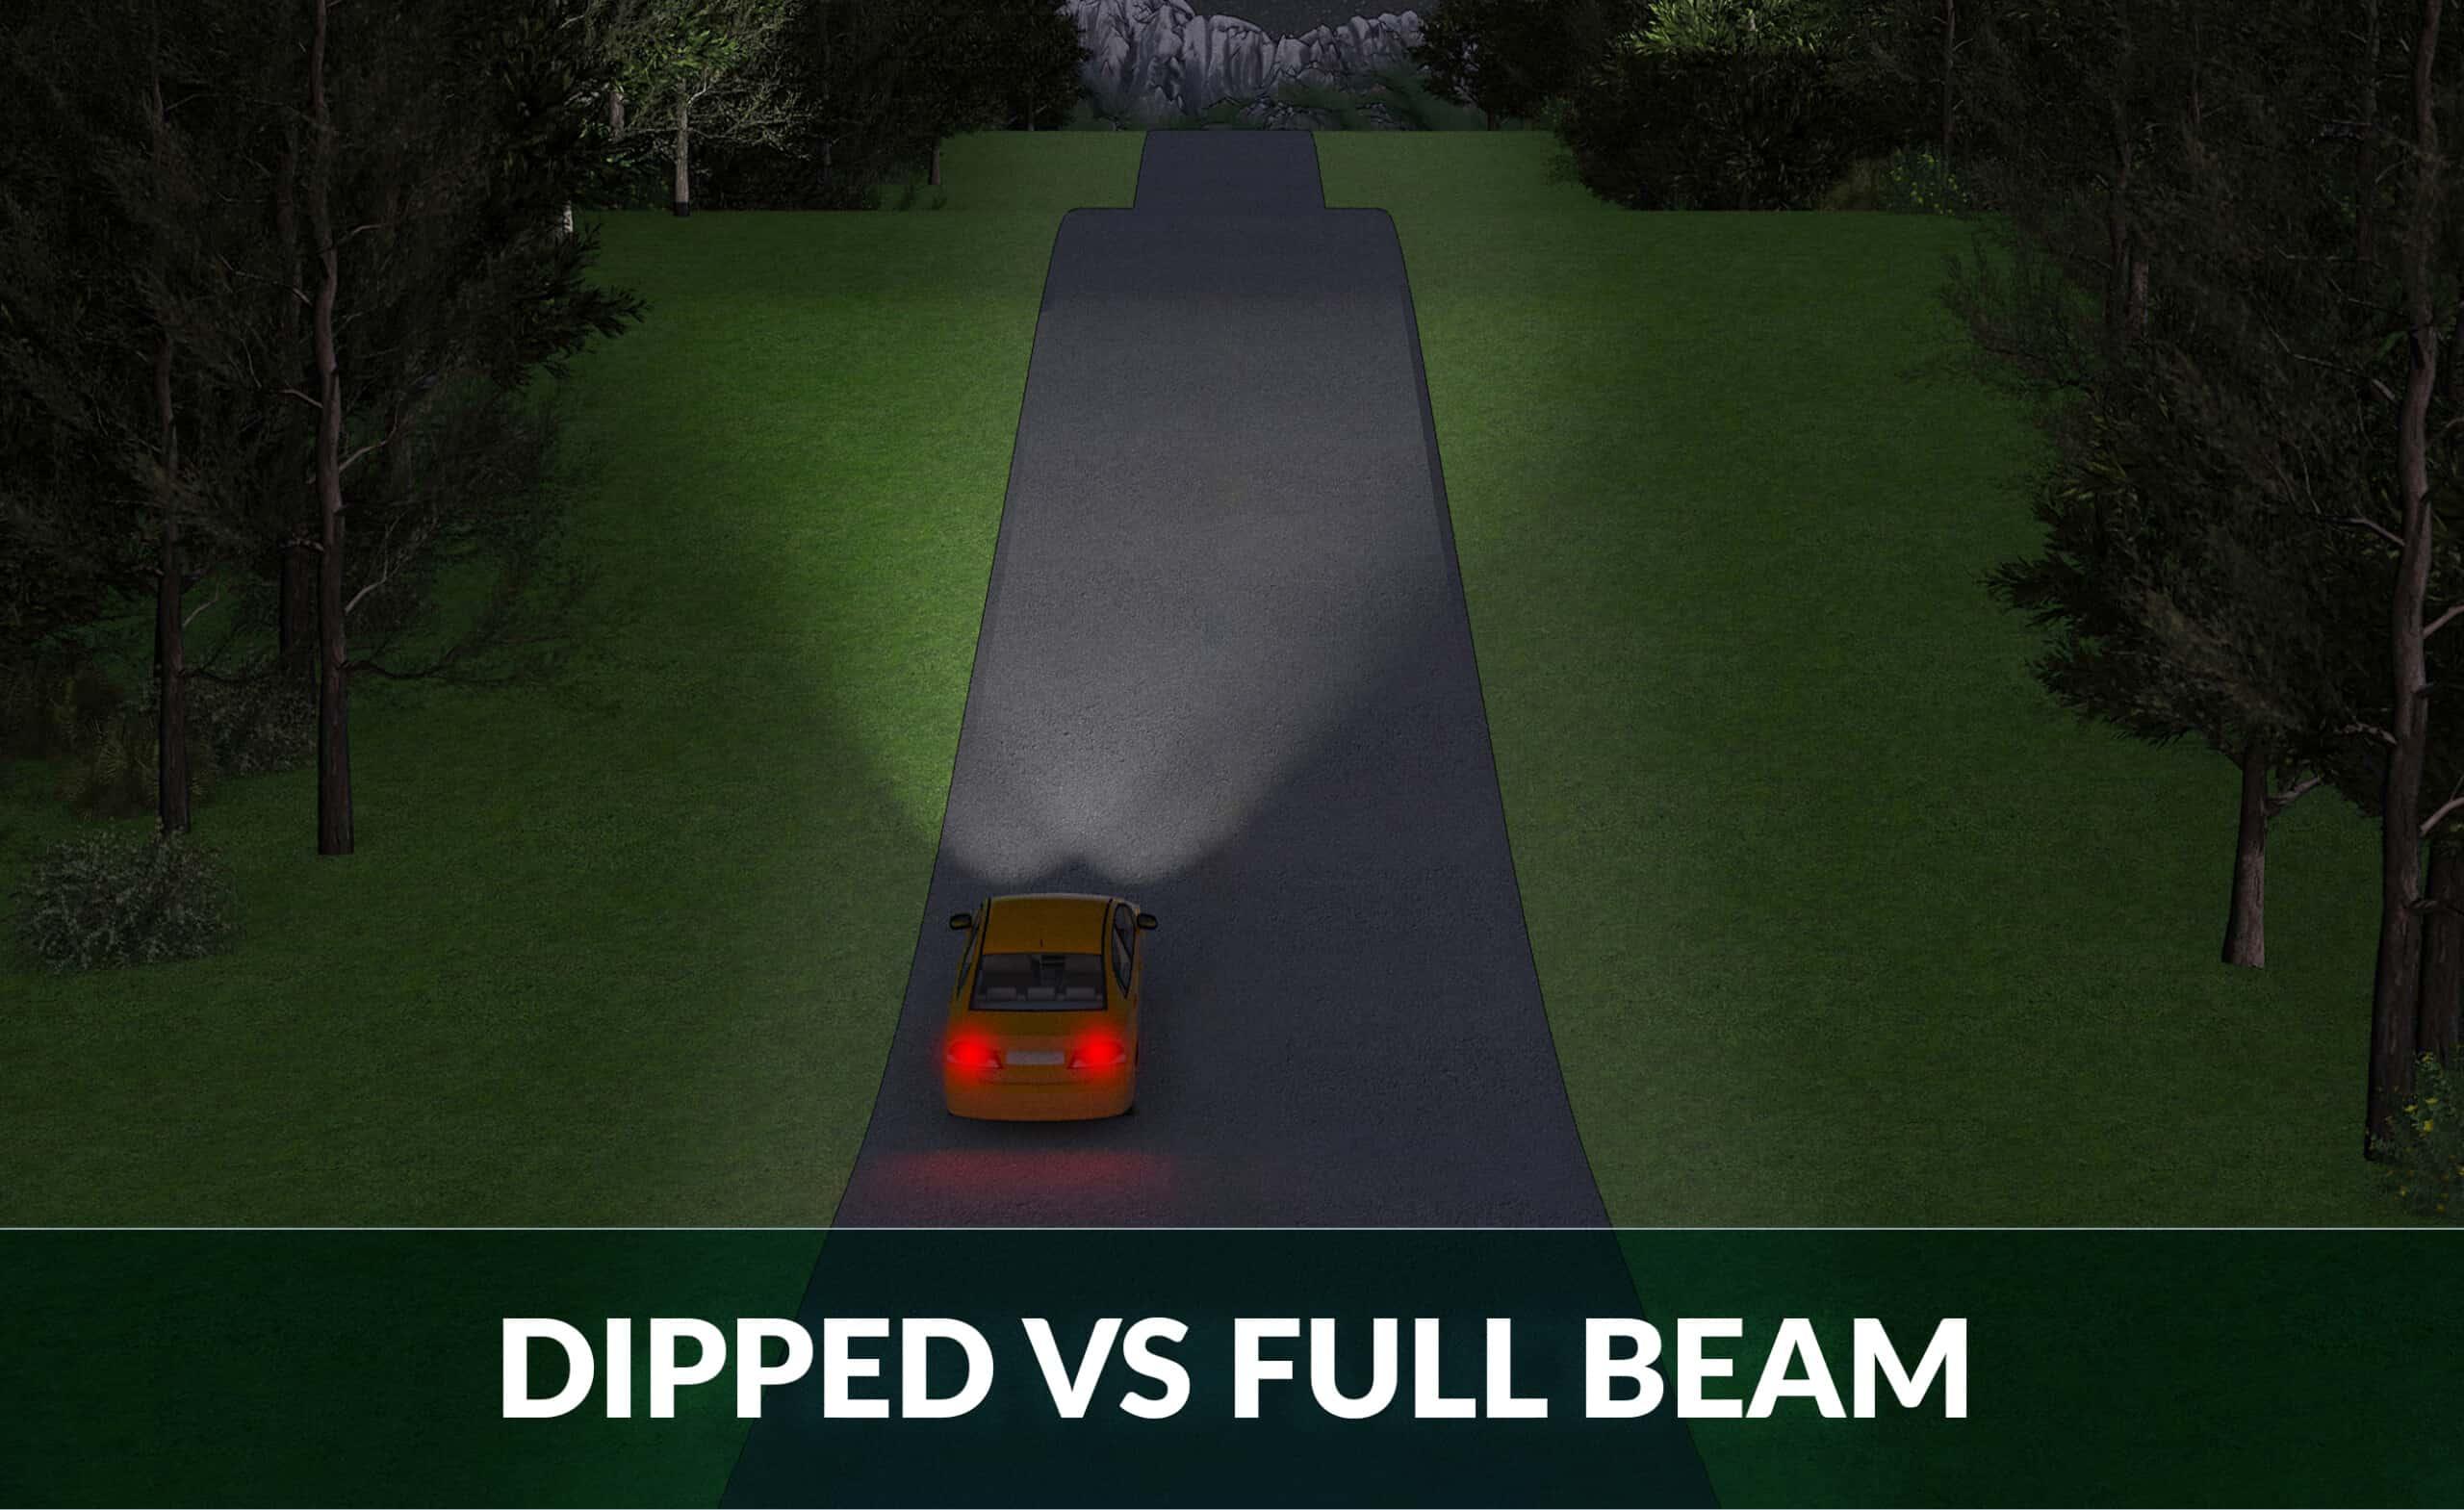 dipped vs full beam headlights